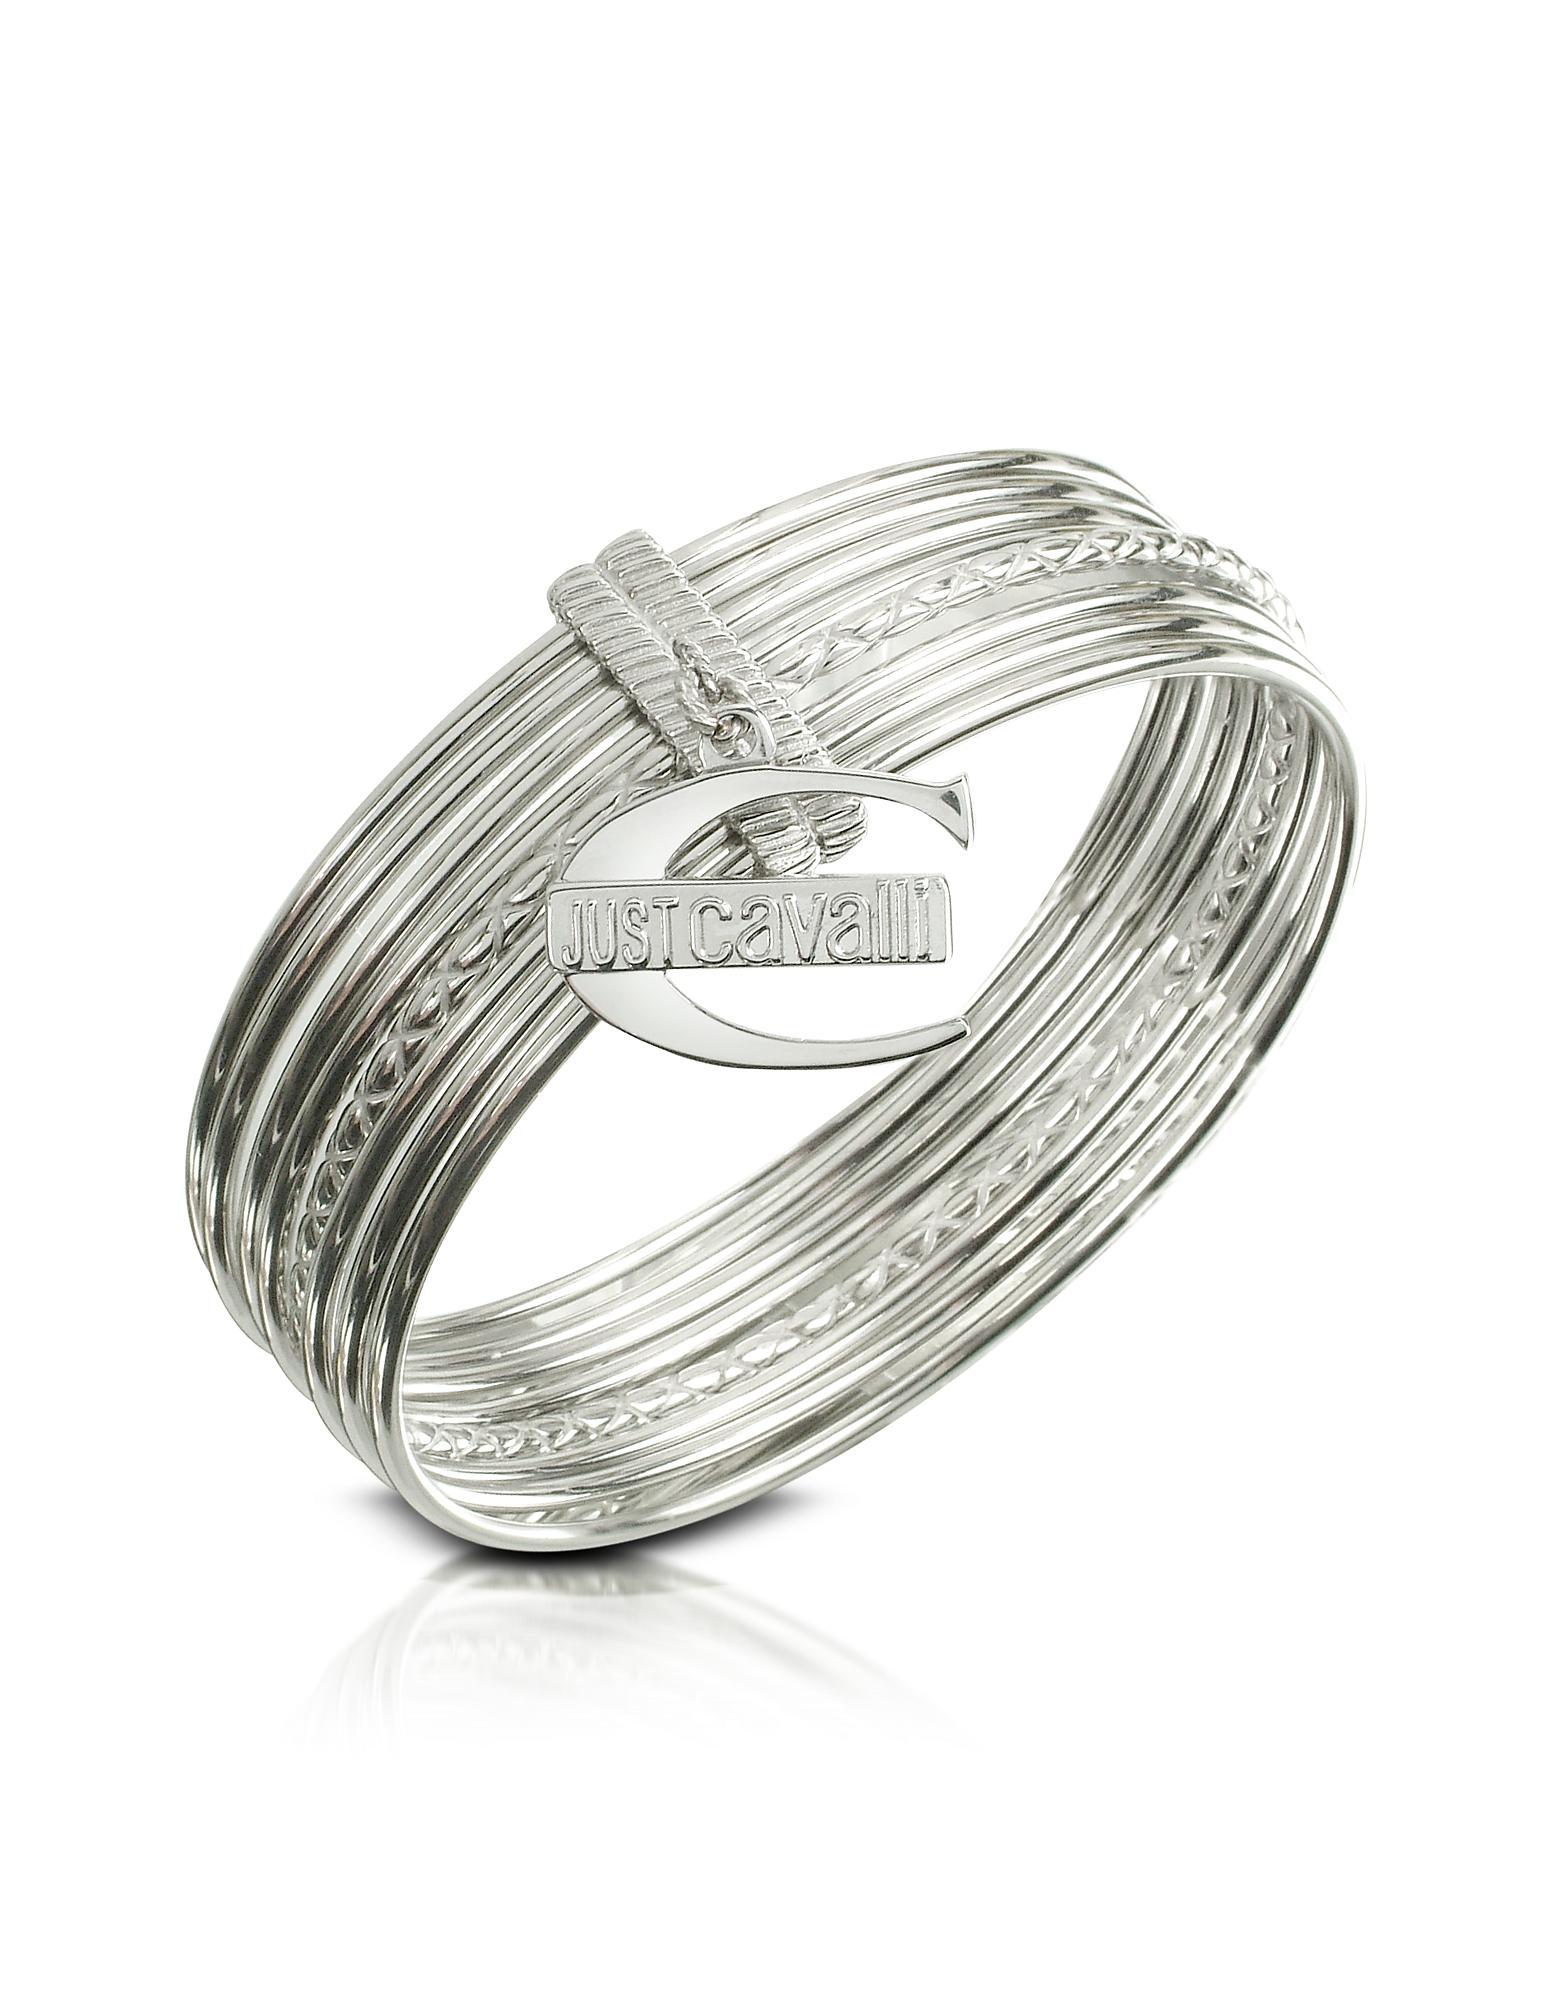 Just Cavalli Infinity Logo Charm Stacked Bangle Bracelet